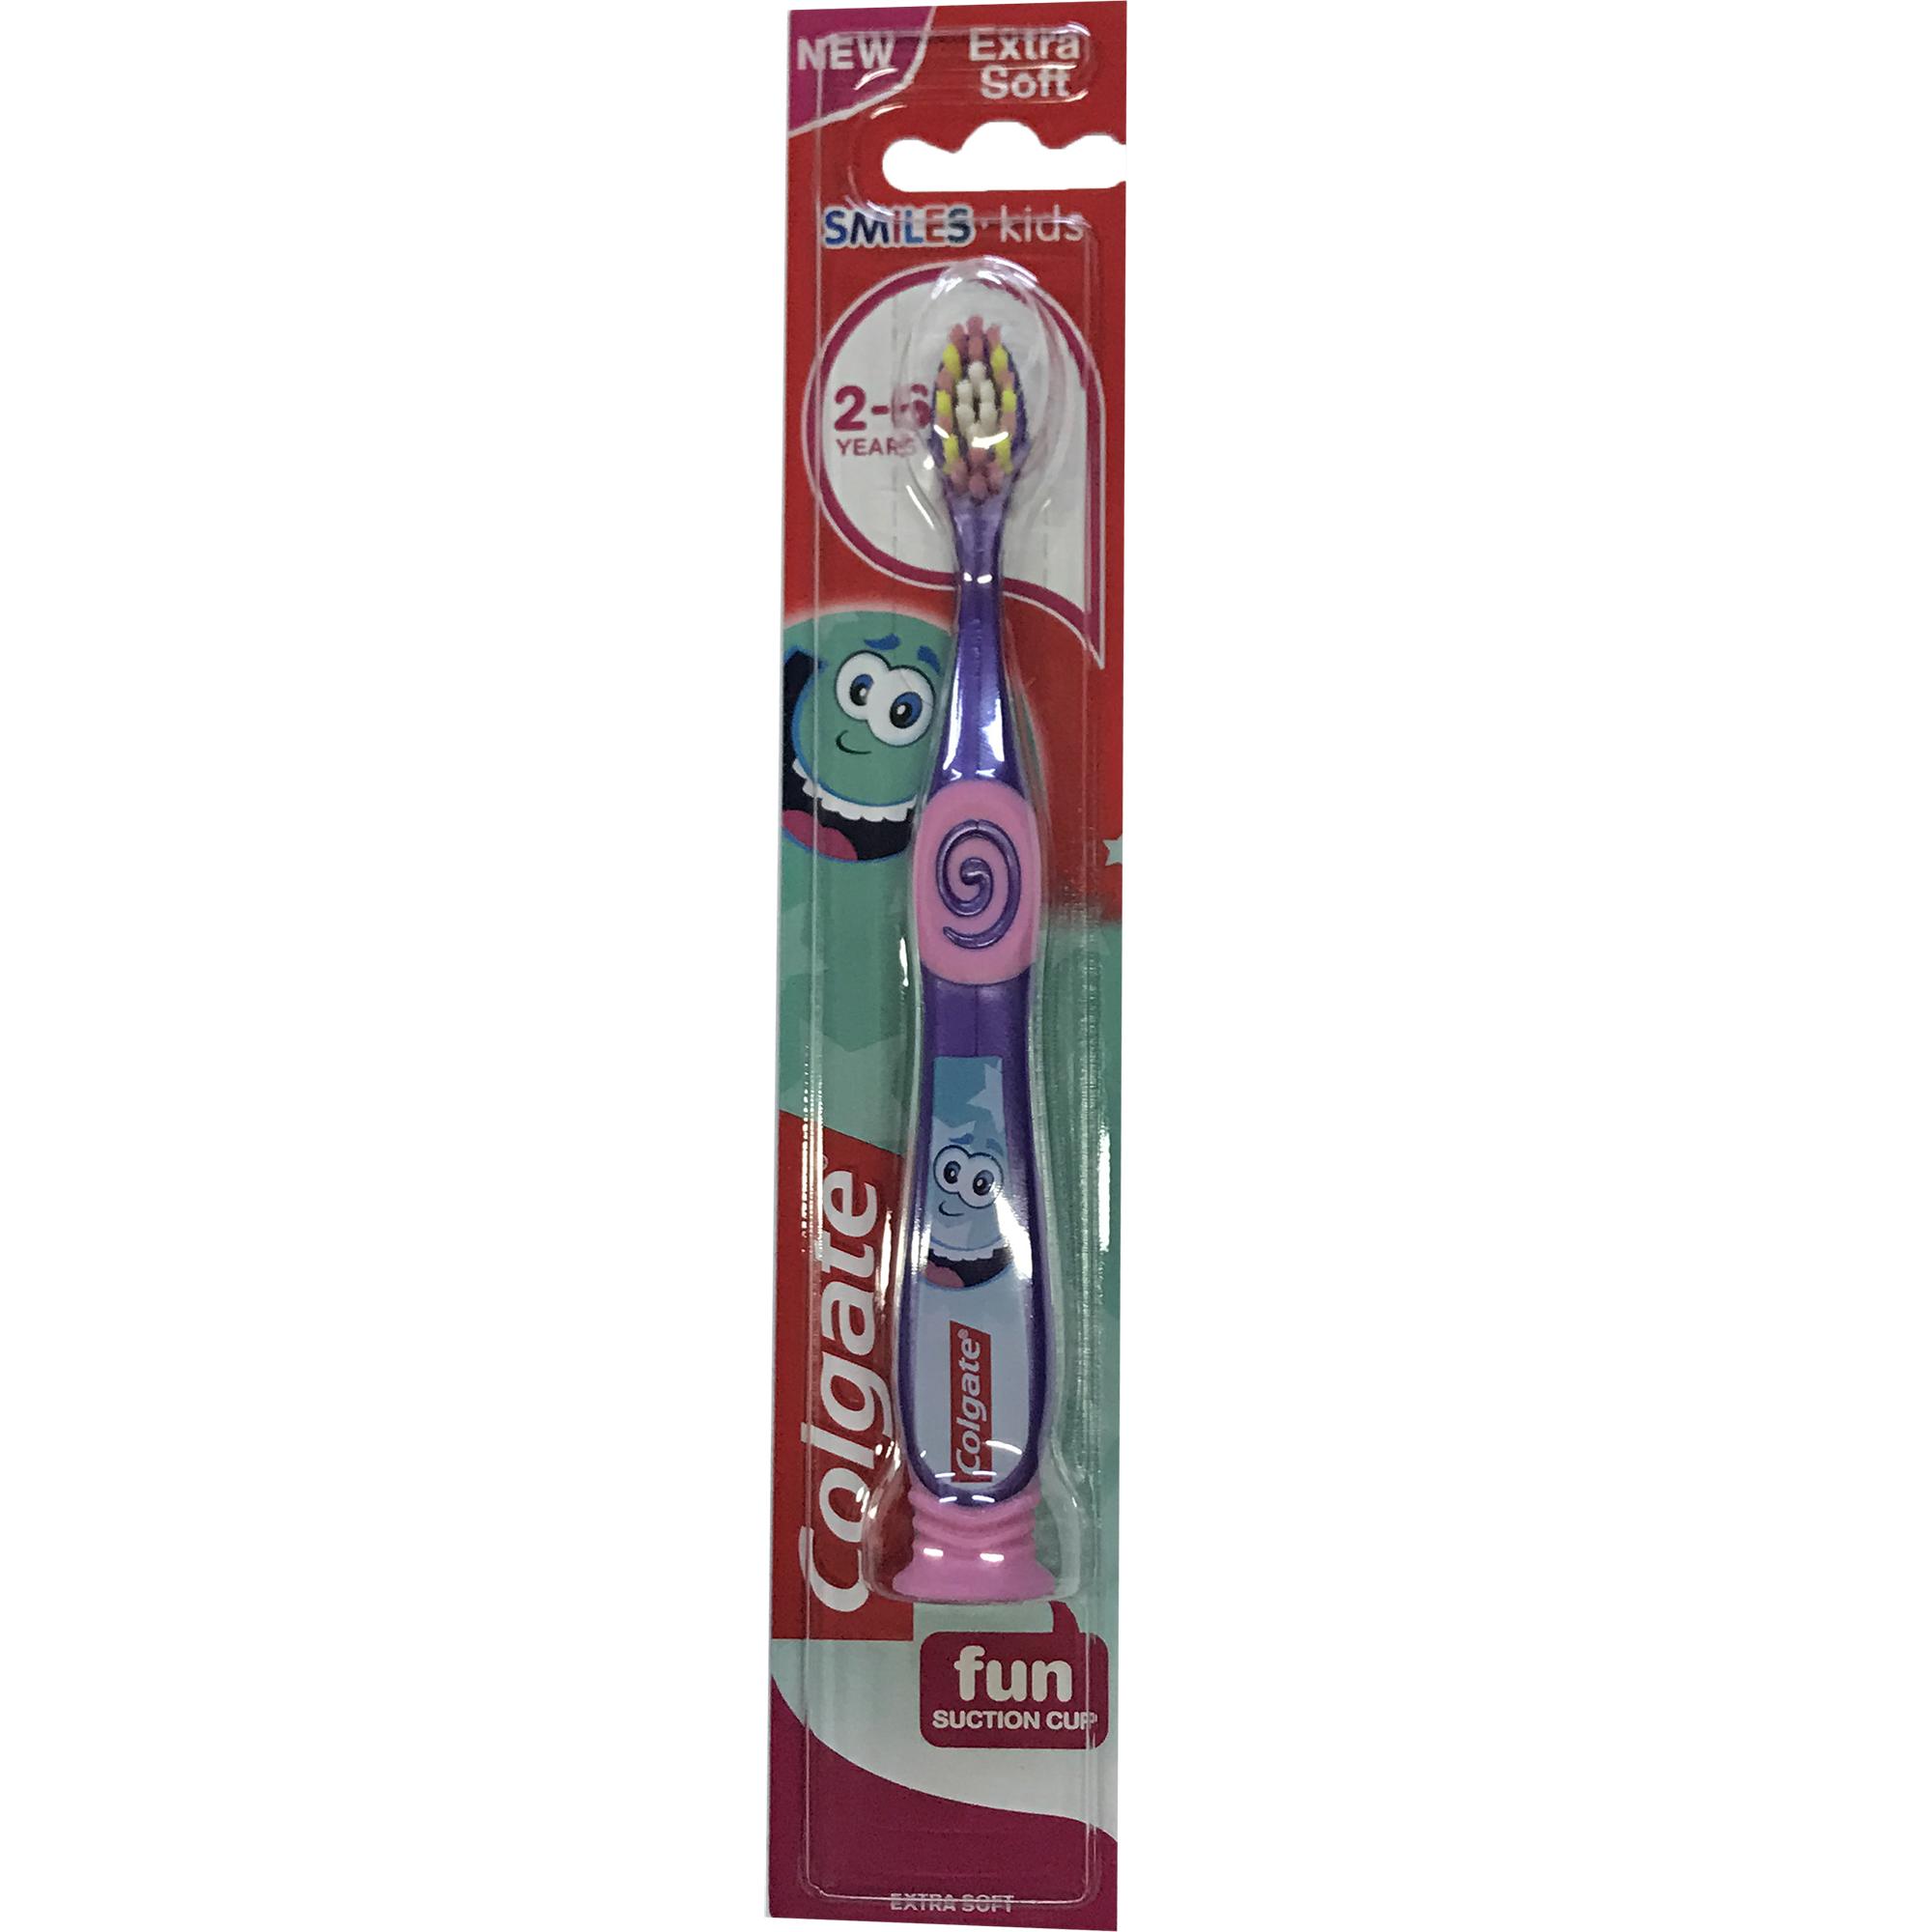 Colgate Smiles Kids Extra Soft Παιδική Οδοντόβουρτσα 2-6 Ετών